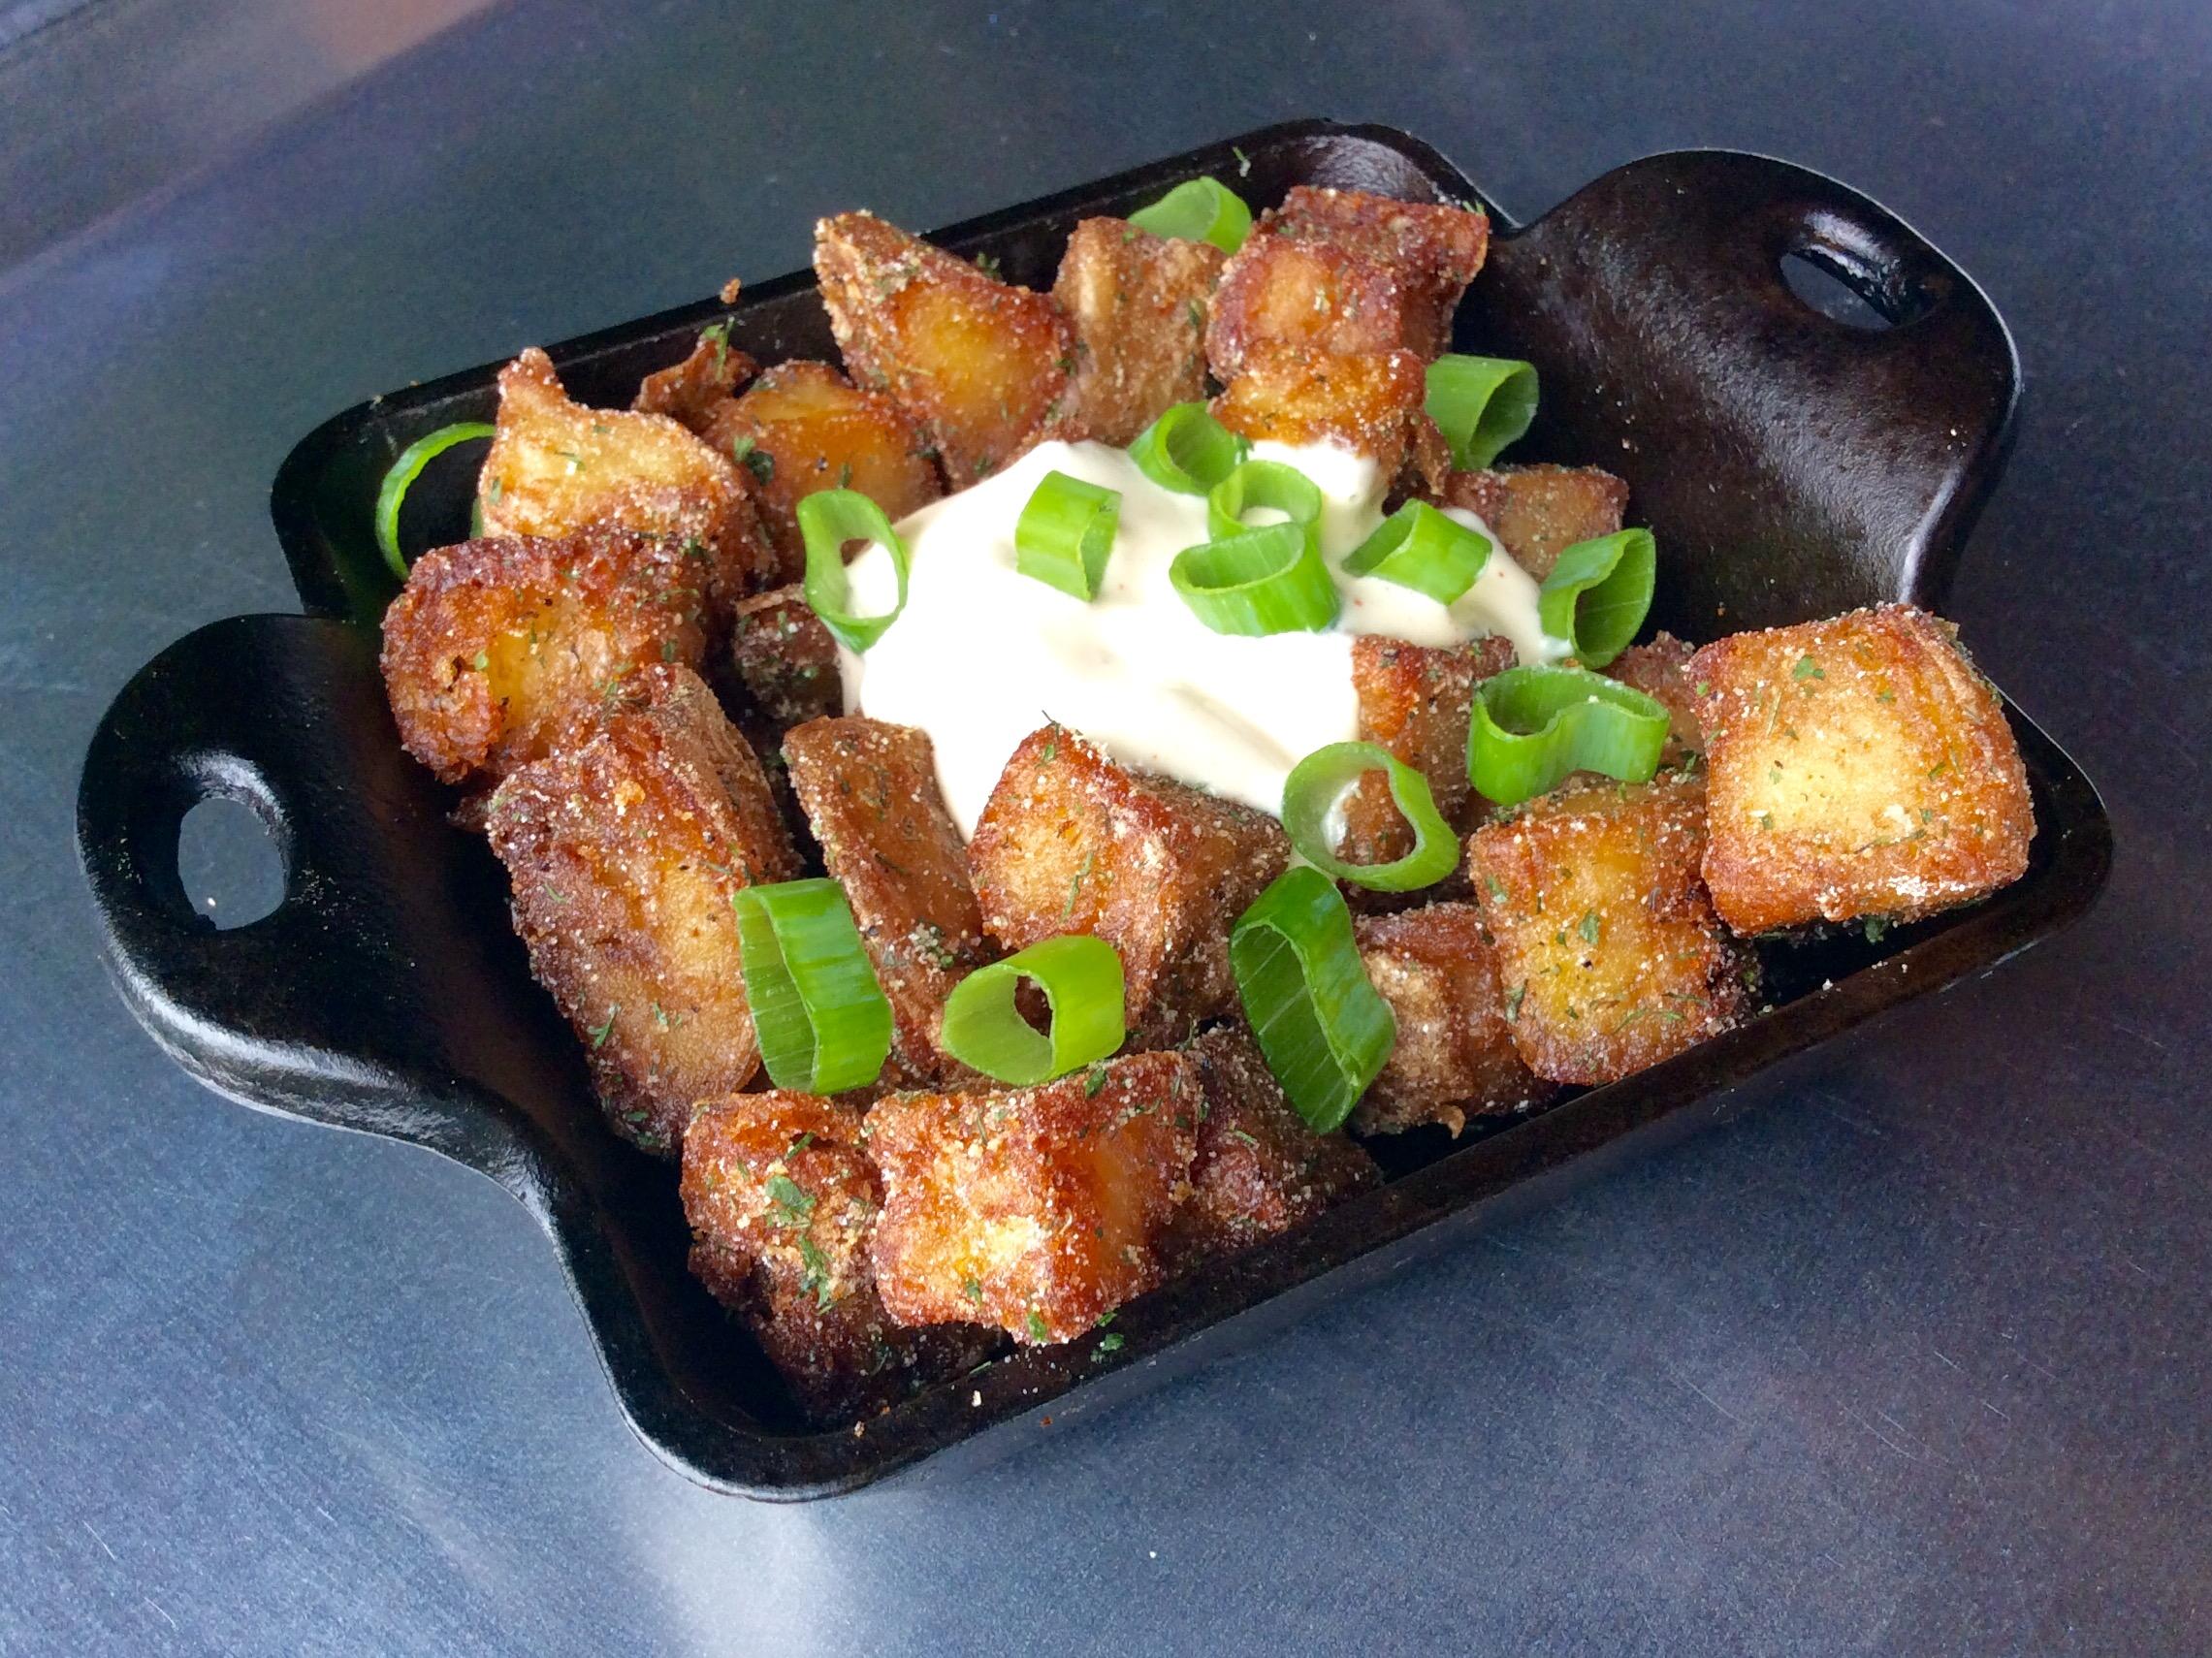 home fries - ranch.jpg